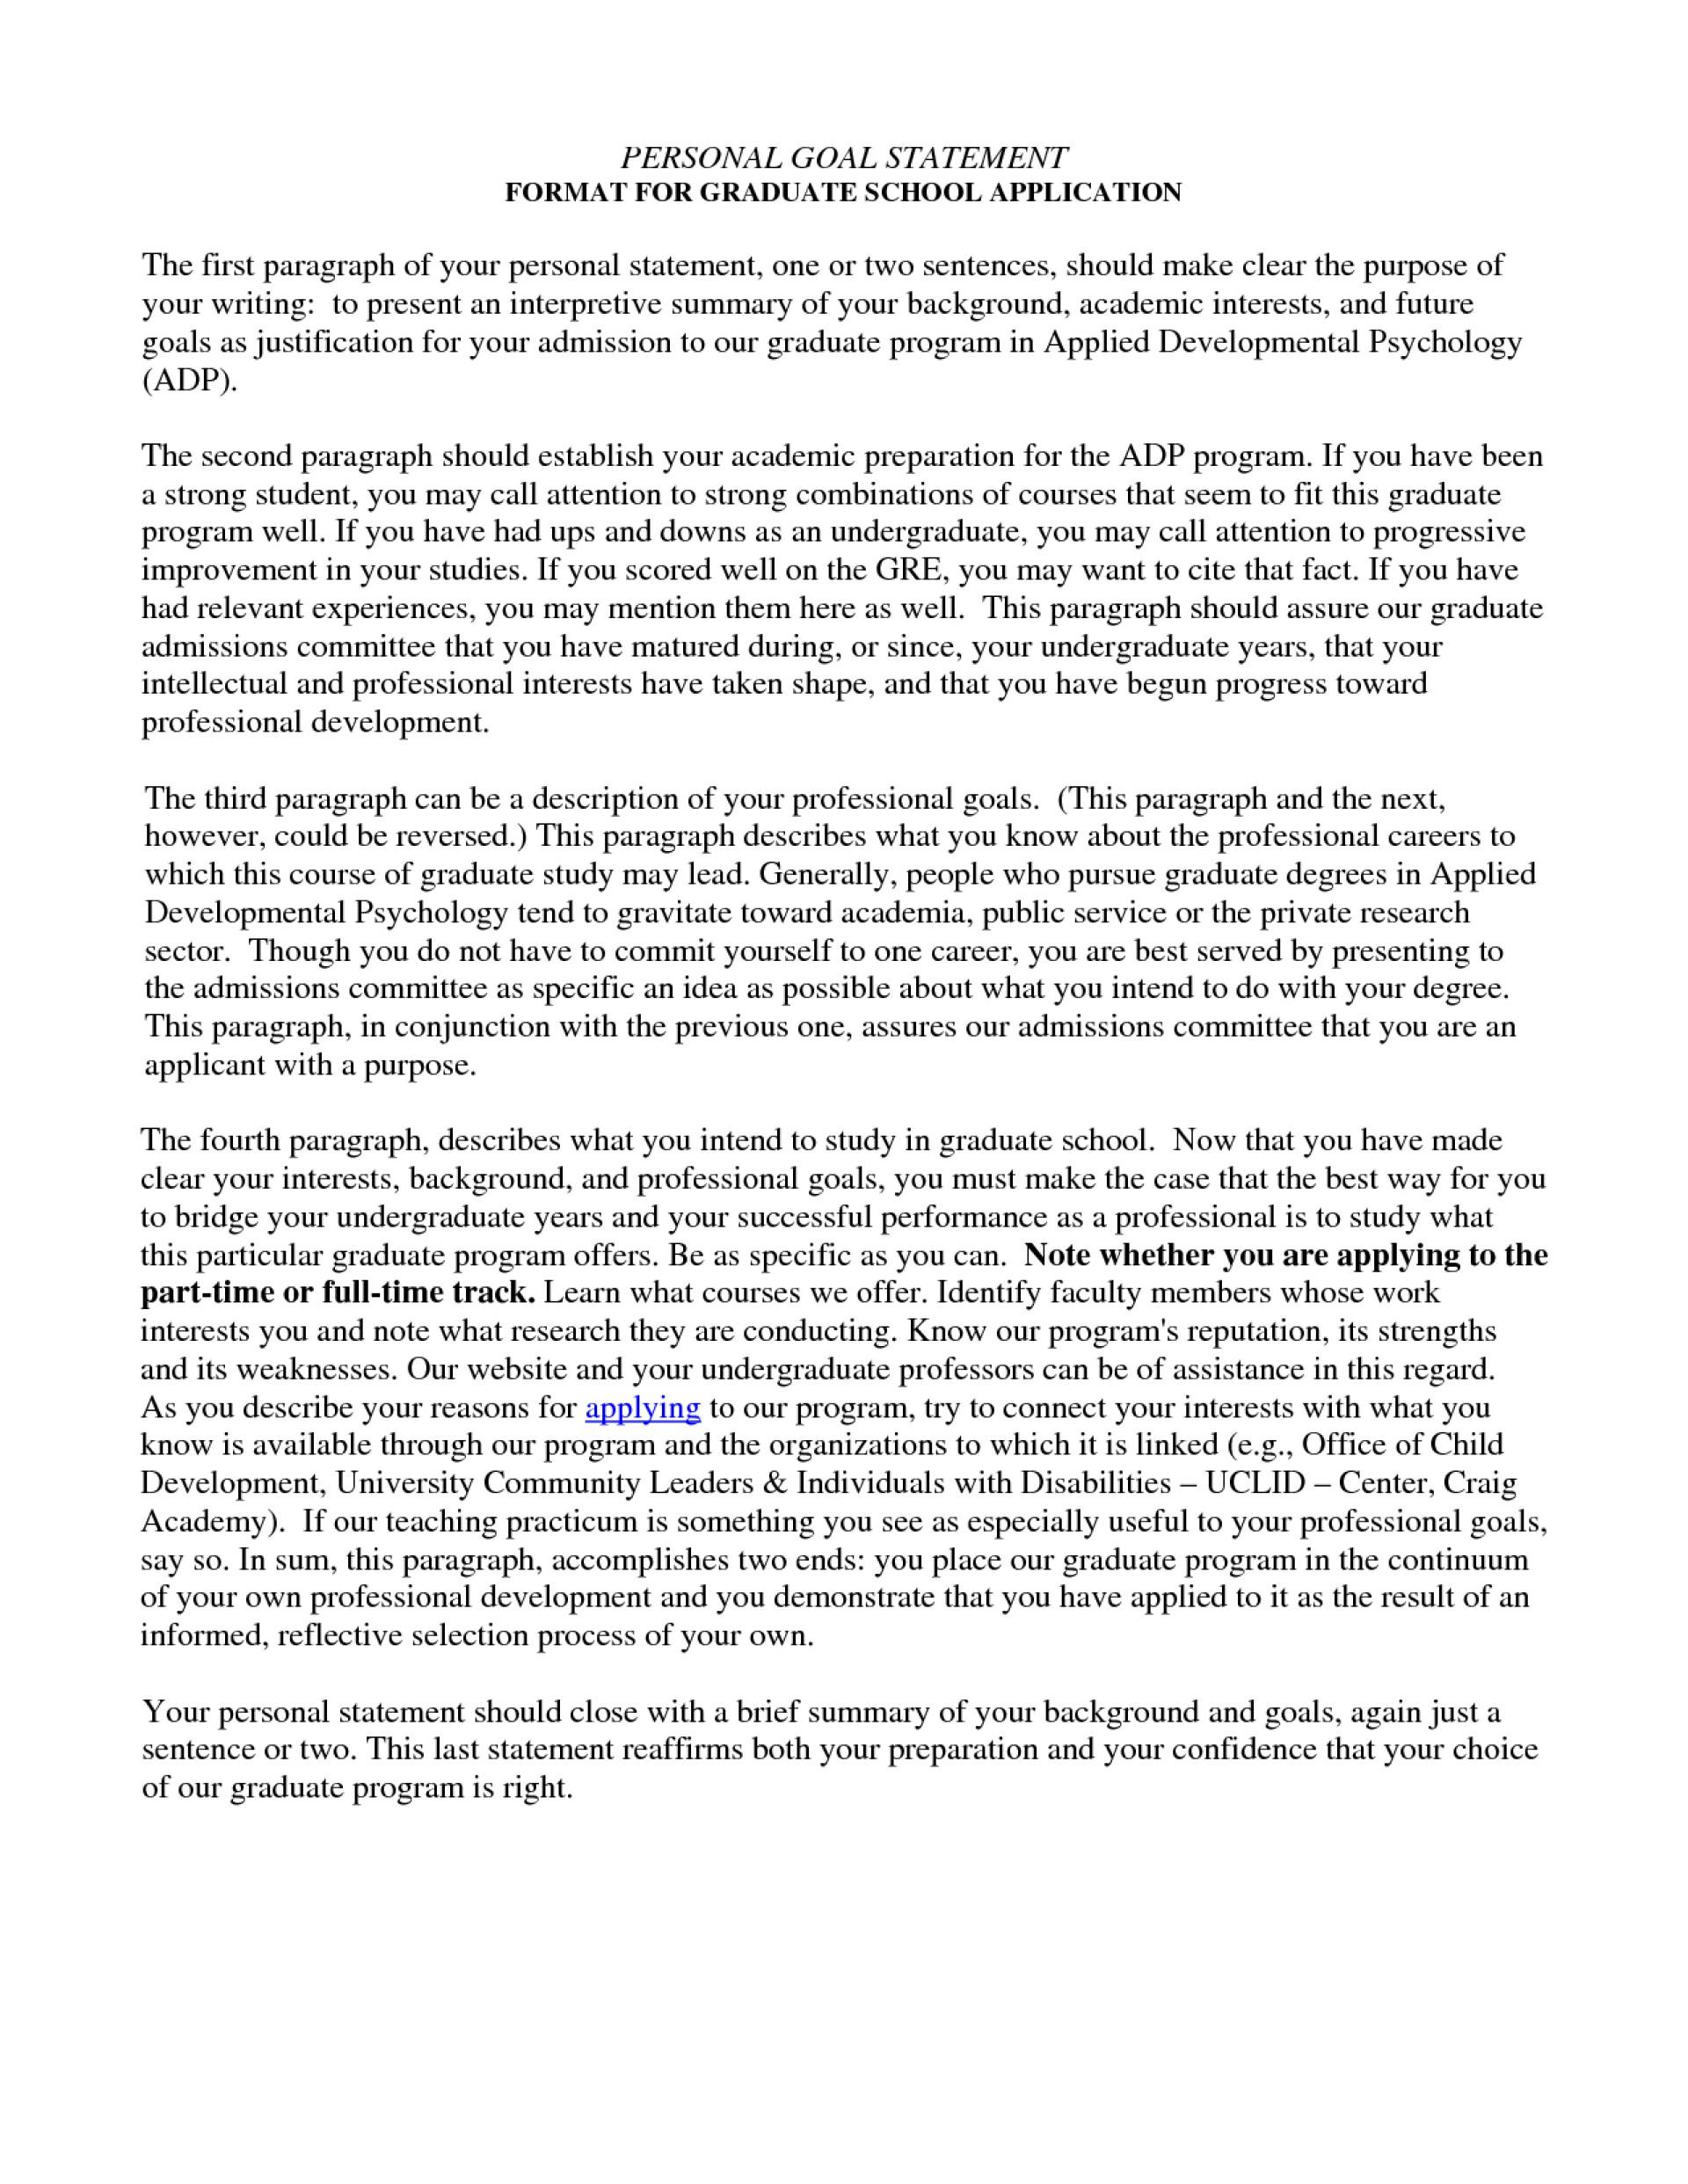 012 Essay Example Statement Of Purpose Graduate School Sample Essays Top Examples Mba Nursing 1920